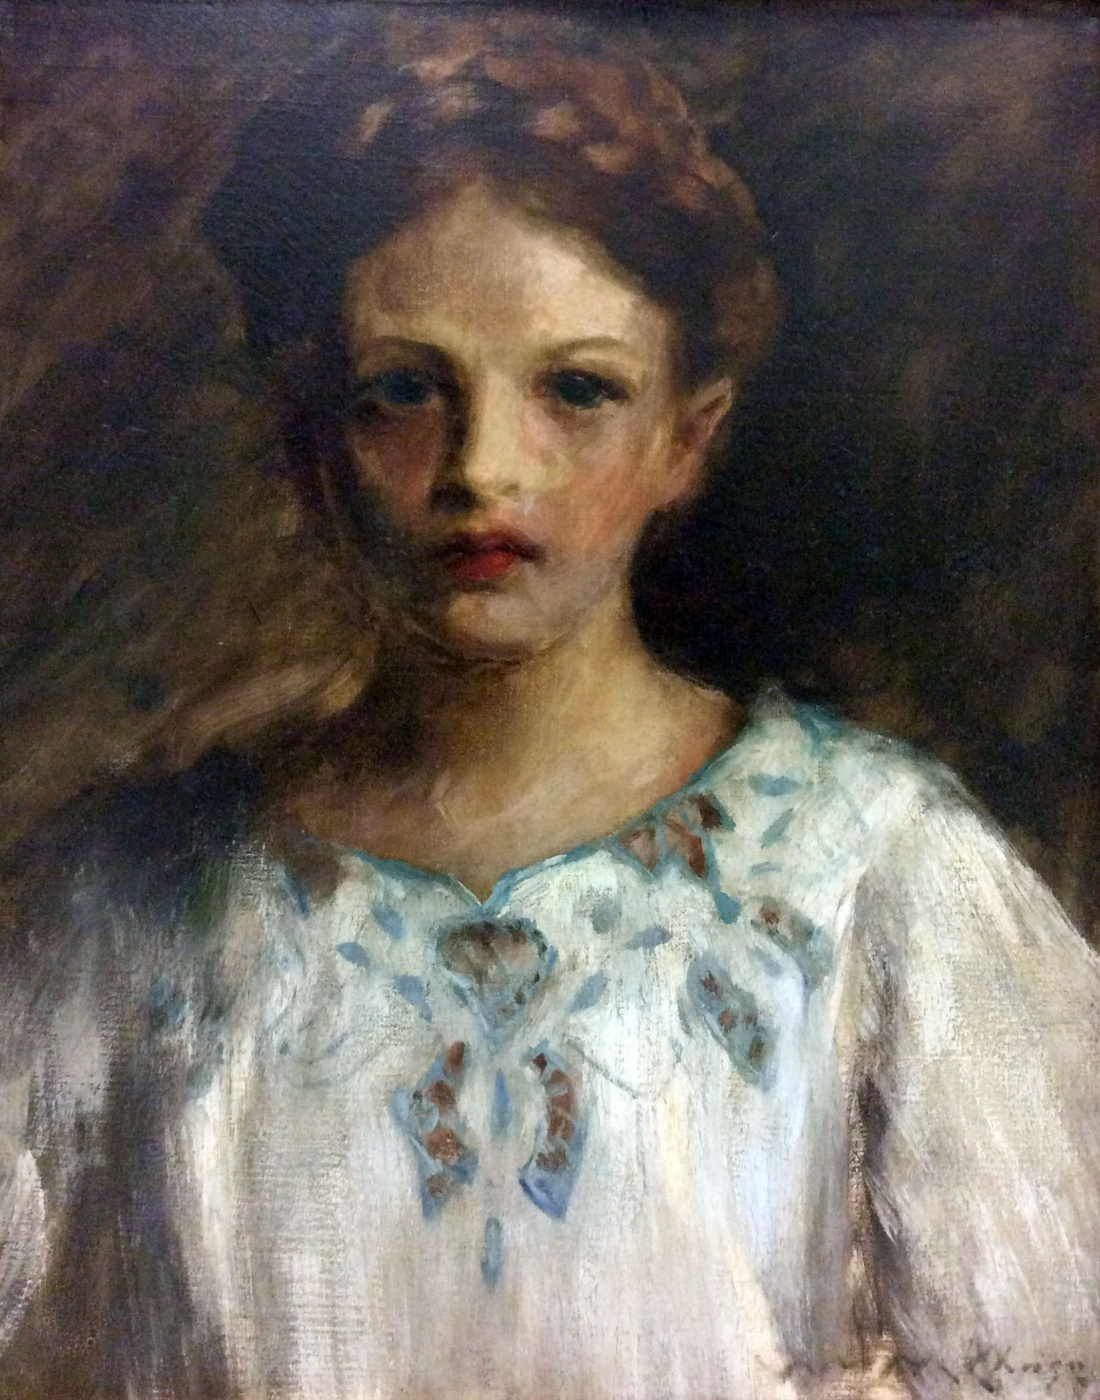 William Merritt Chase. Portrait of Baroness IDA-Gro van Dahlerup